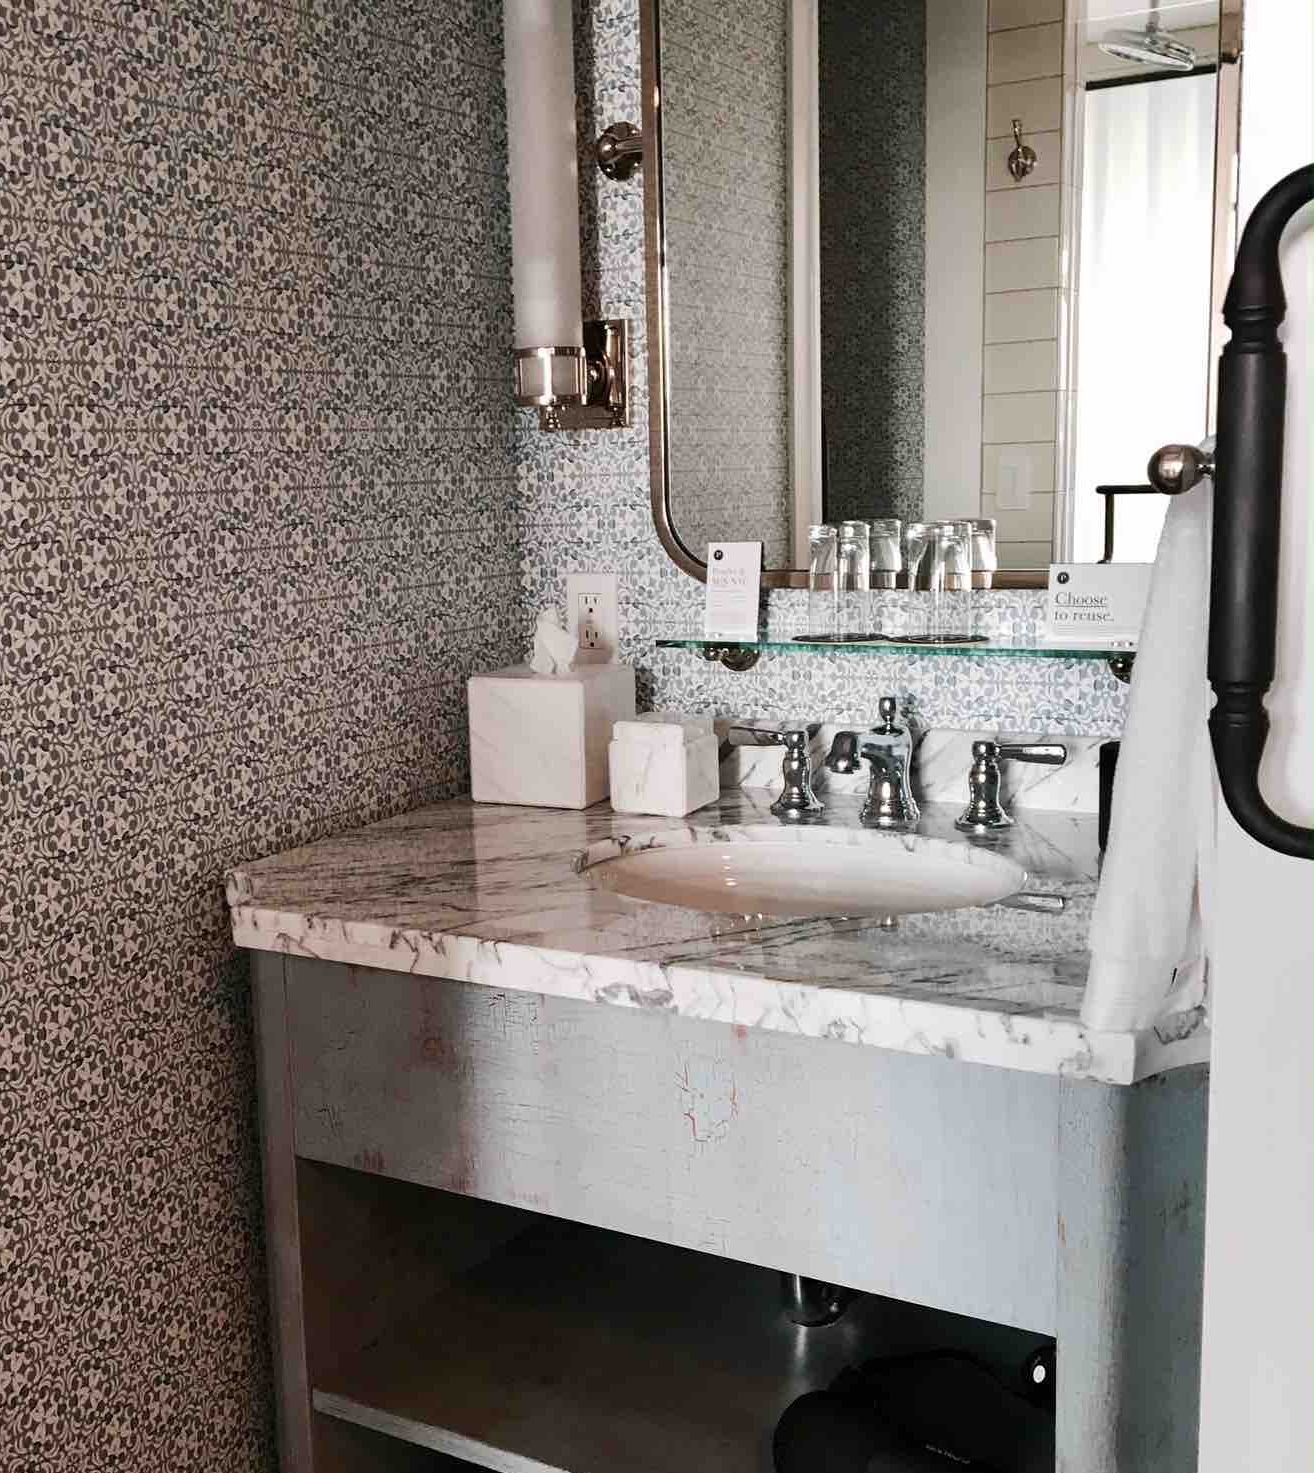 The Pendry San Diego Bathroom.jpg